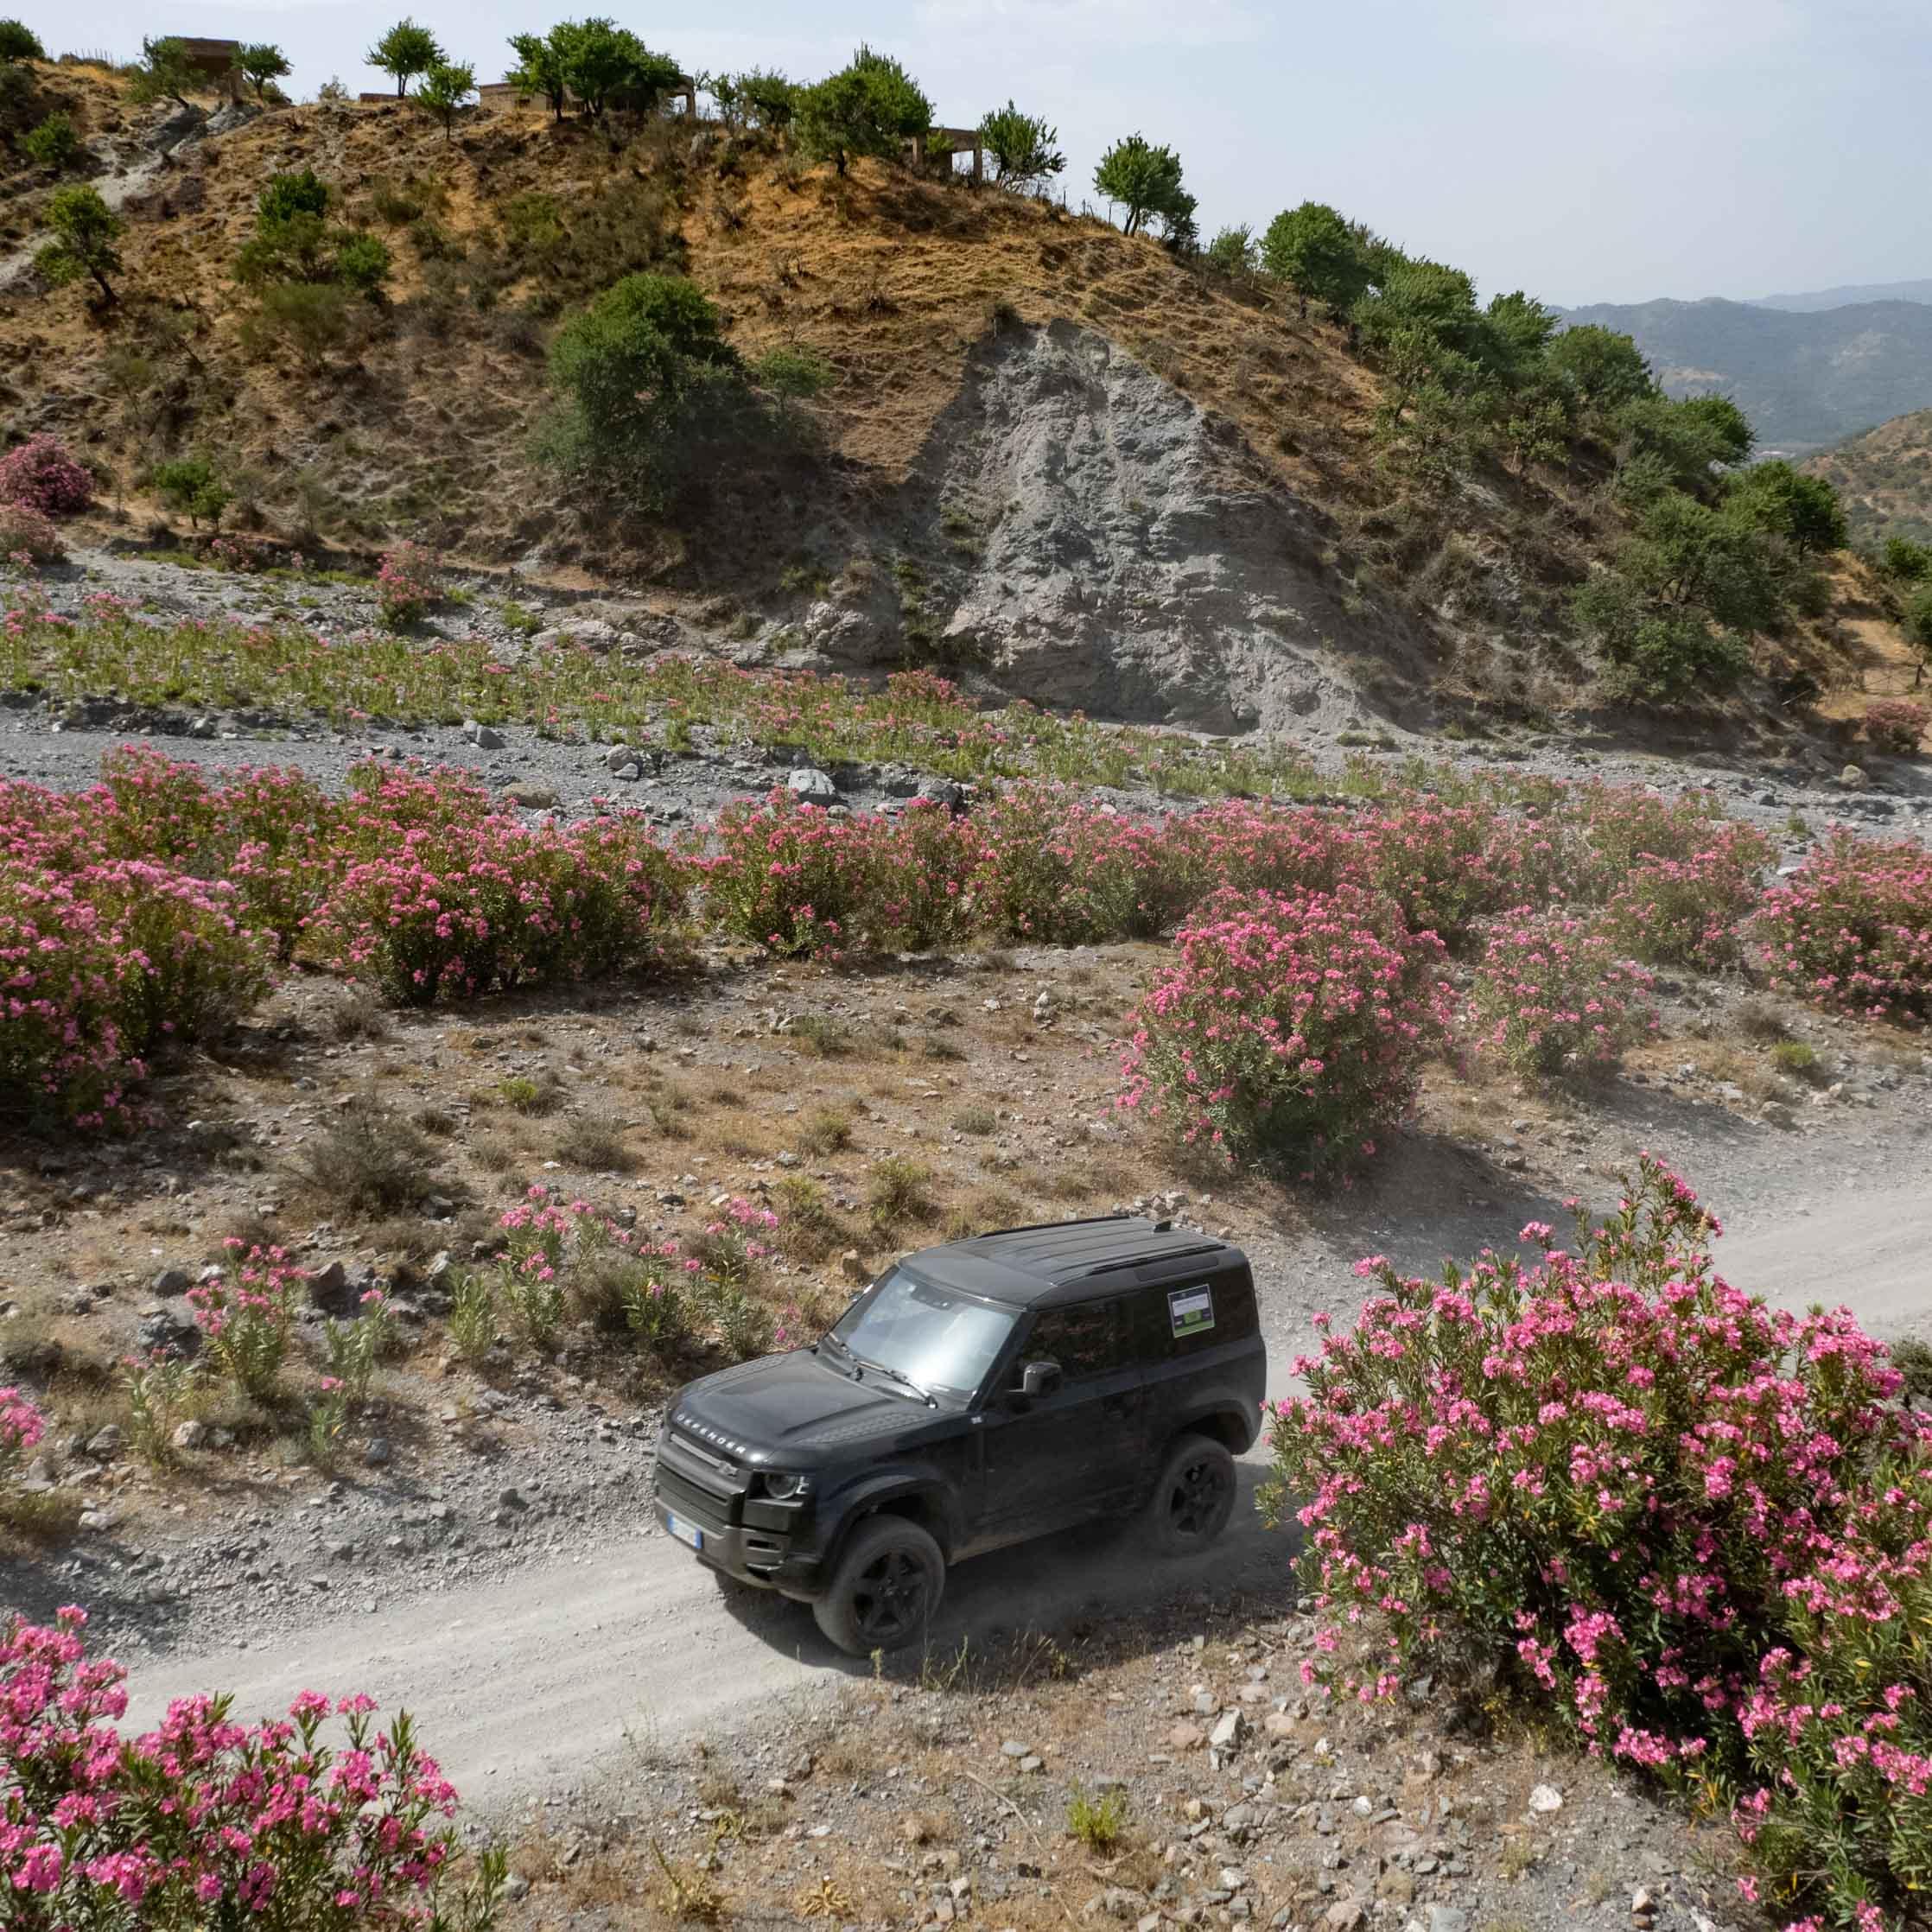 Land_Rover_Tour_Sicilia_2021_Land_Rover_Experience_Italia_-7